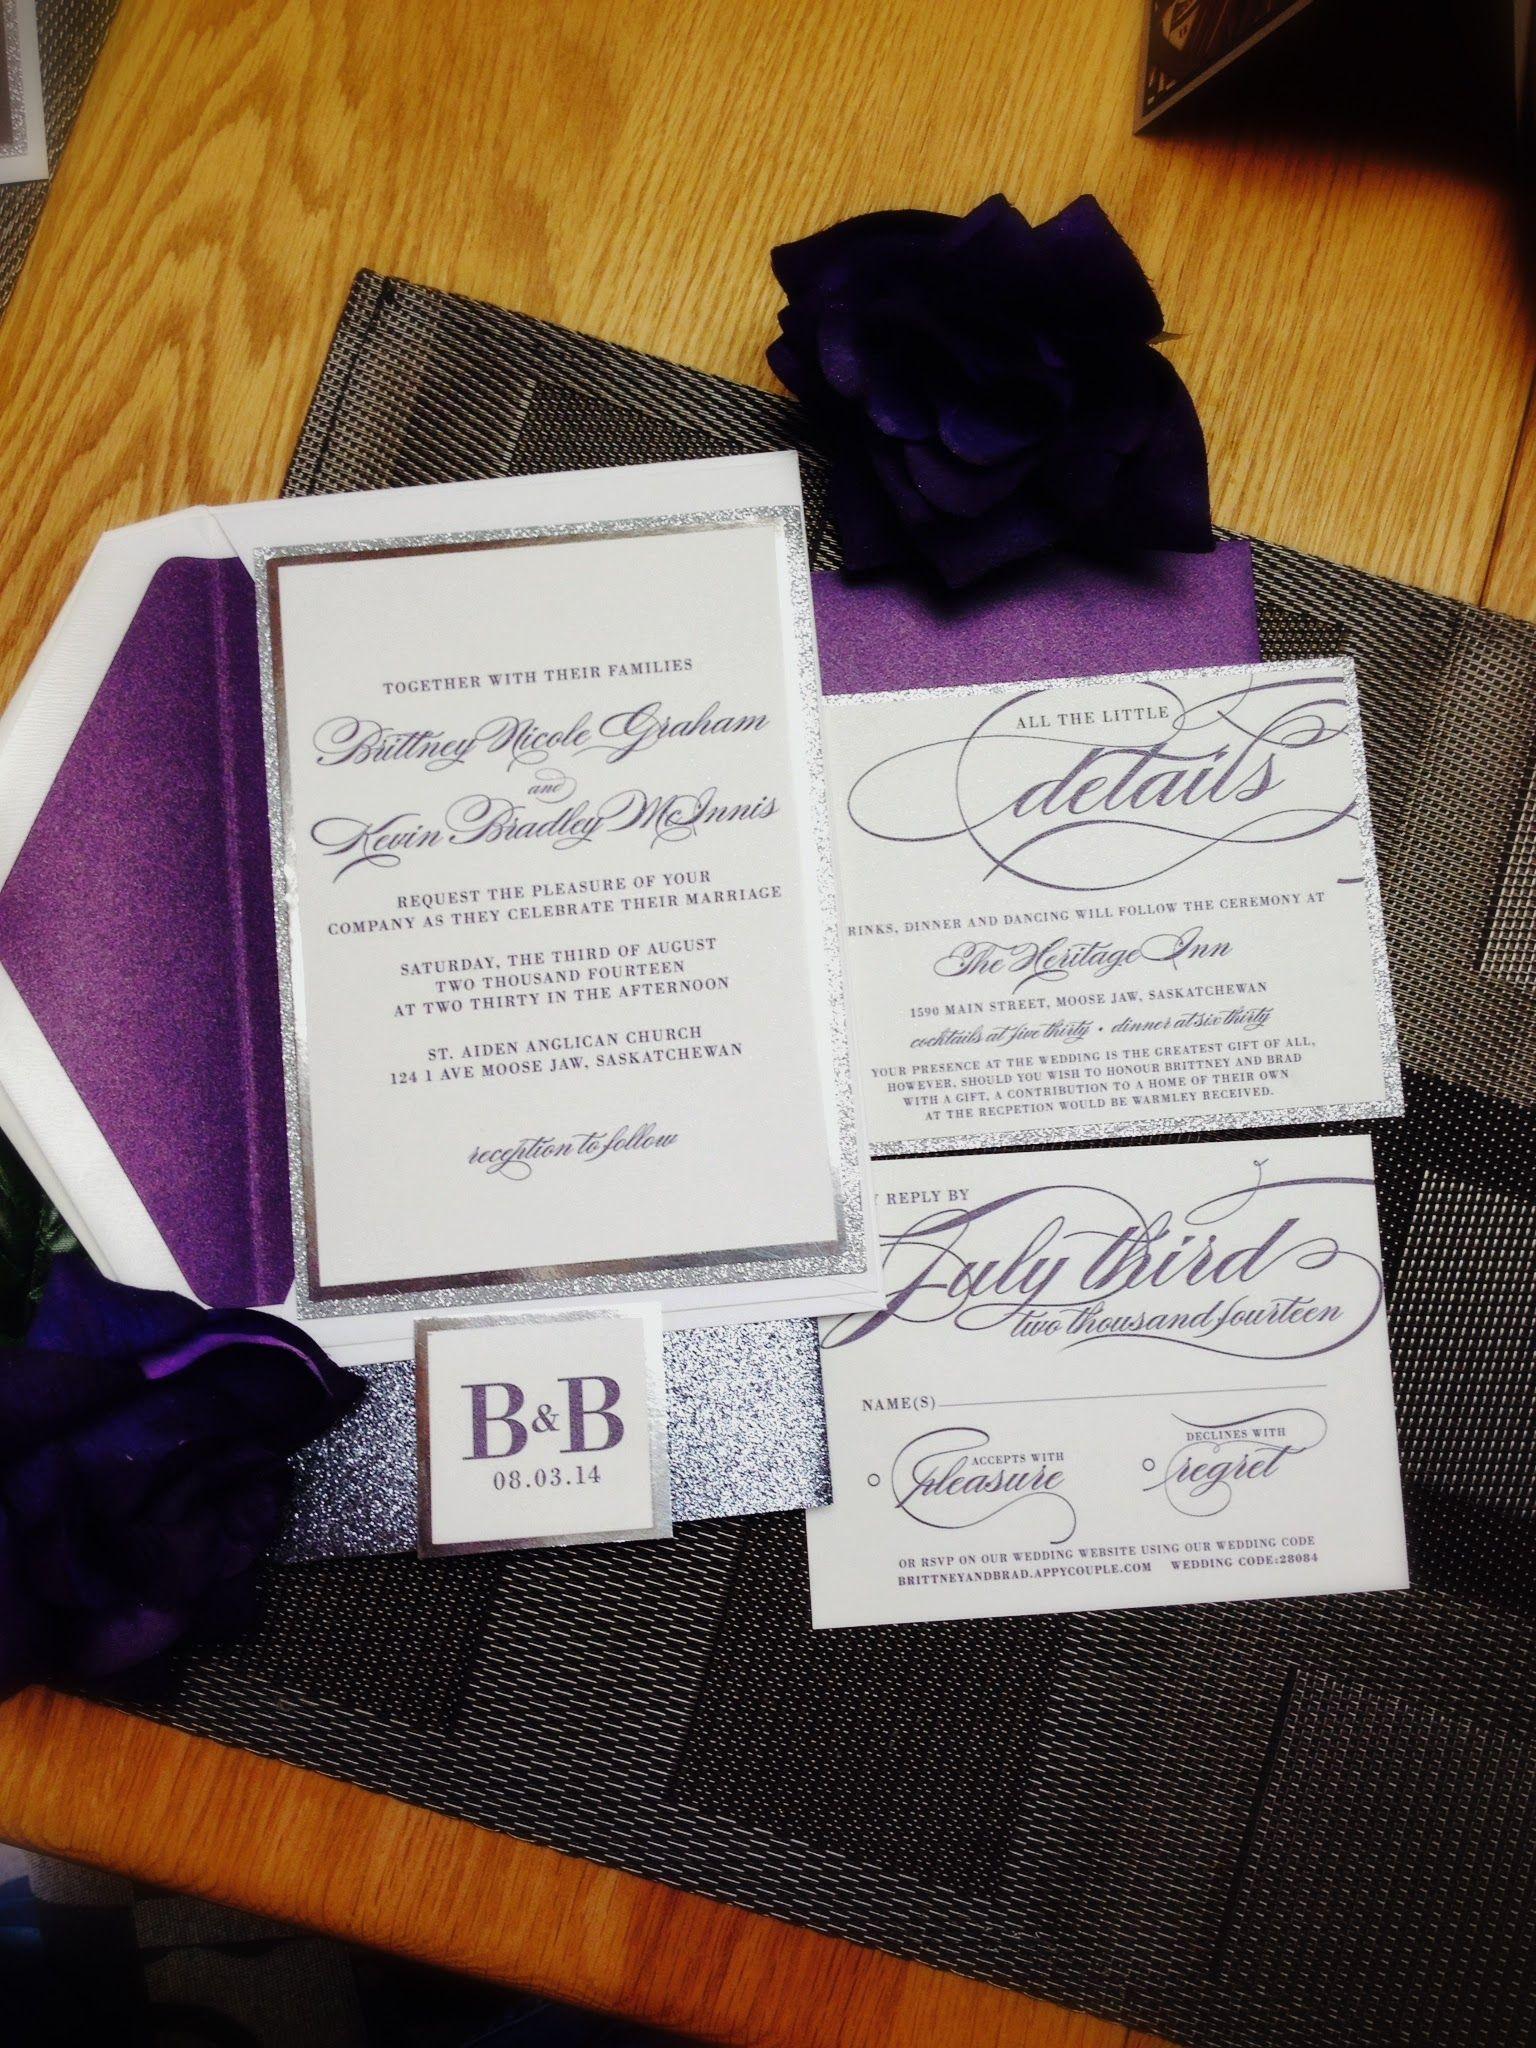 Our Invitations: Purple, Silver & Sparkle | Weddingbee Photo Gallery ...